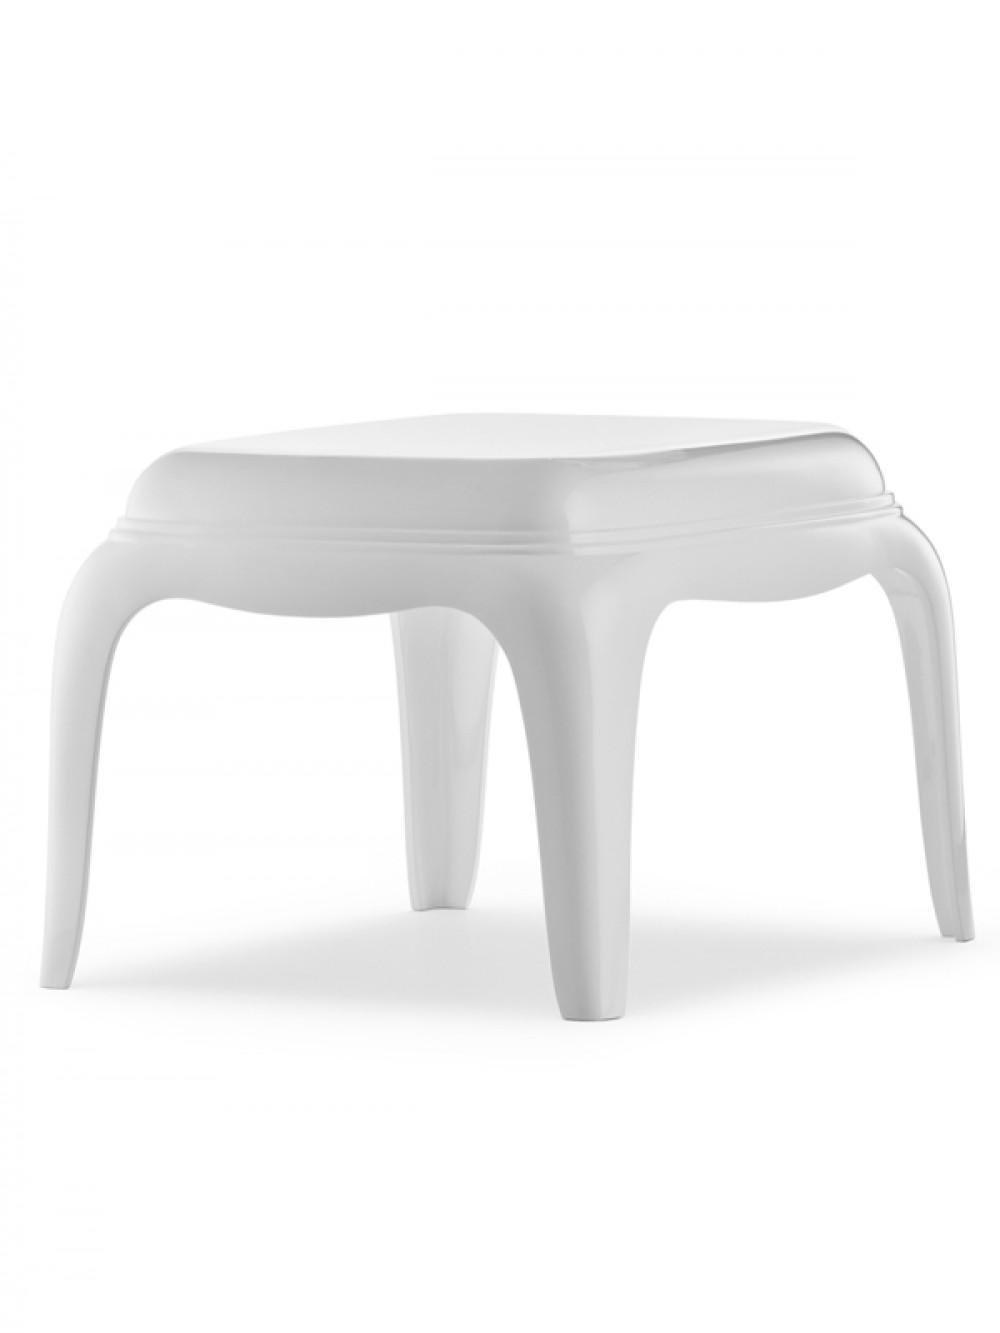 sessel im modern barockstil italienisches design farbe wei. Black Bedroom Furniture Sets. Home Design Ideas